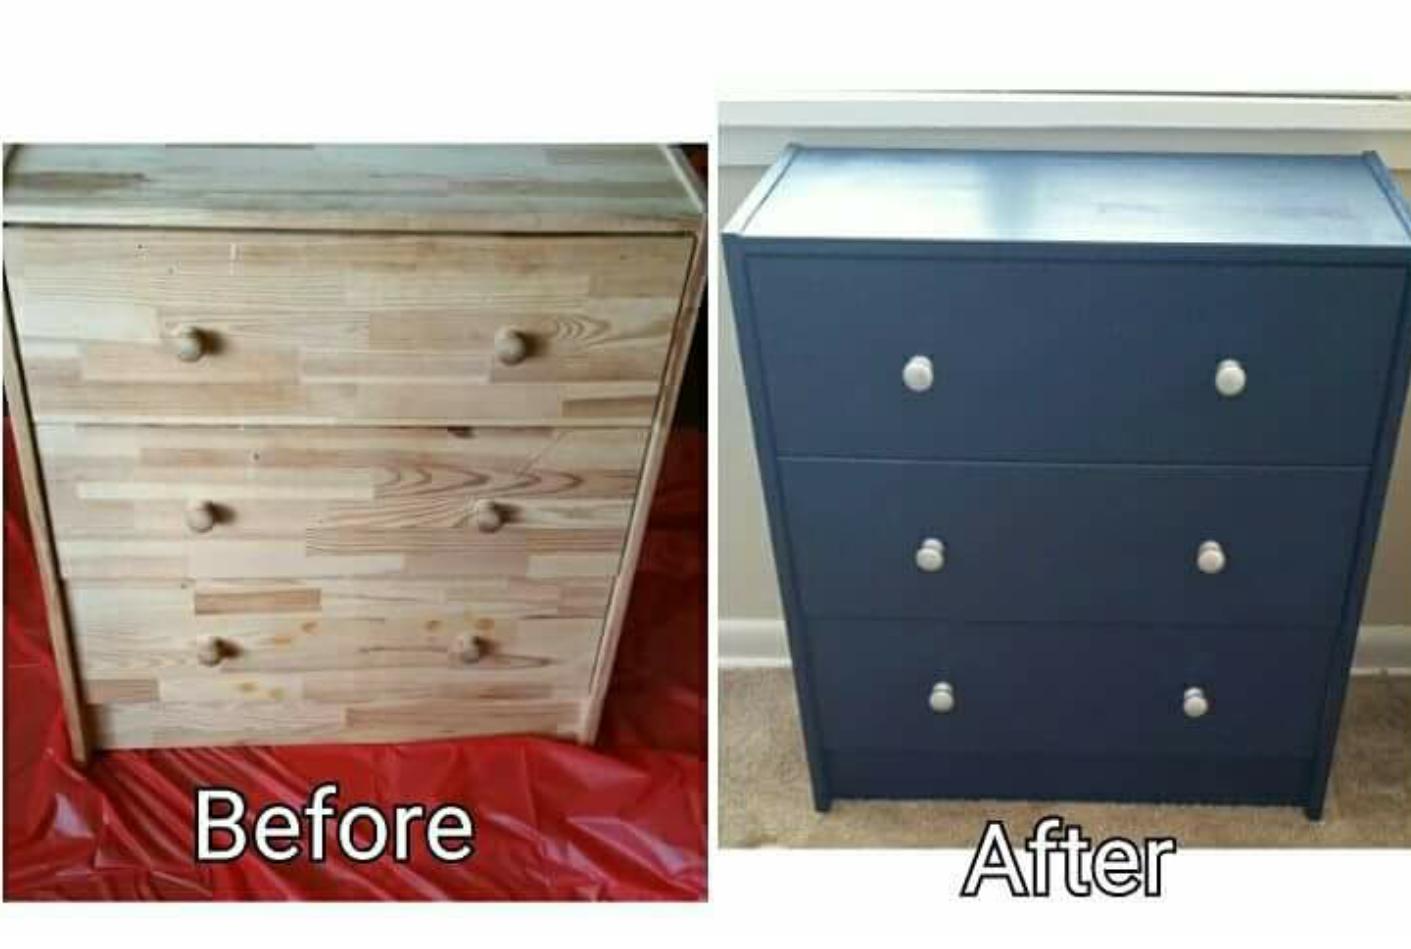 Redid Myself Ikea Rast 3 Drawer Chest I Used A Semi Gloss Paint